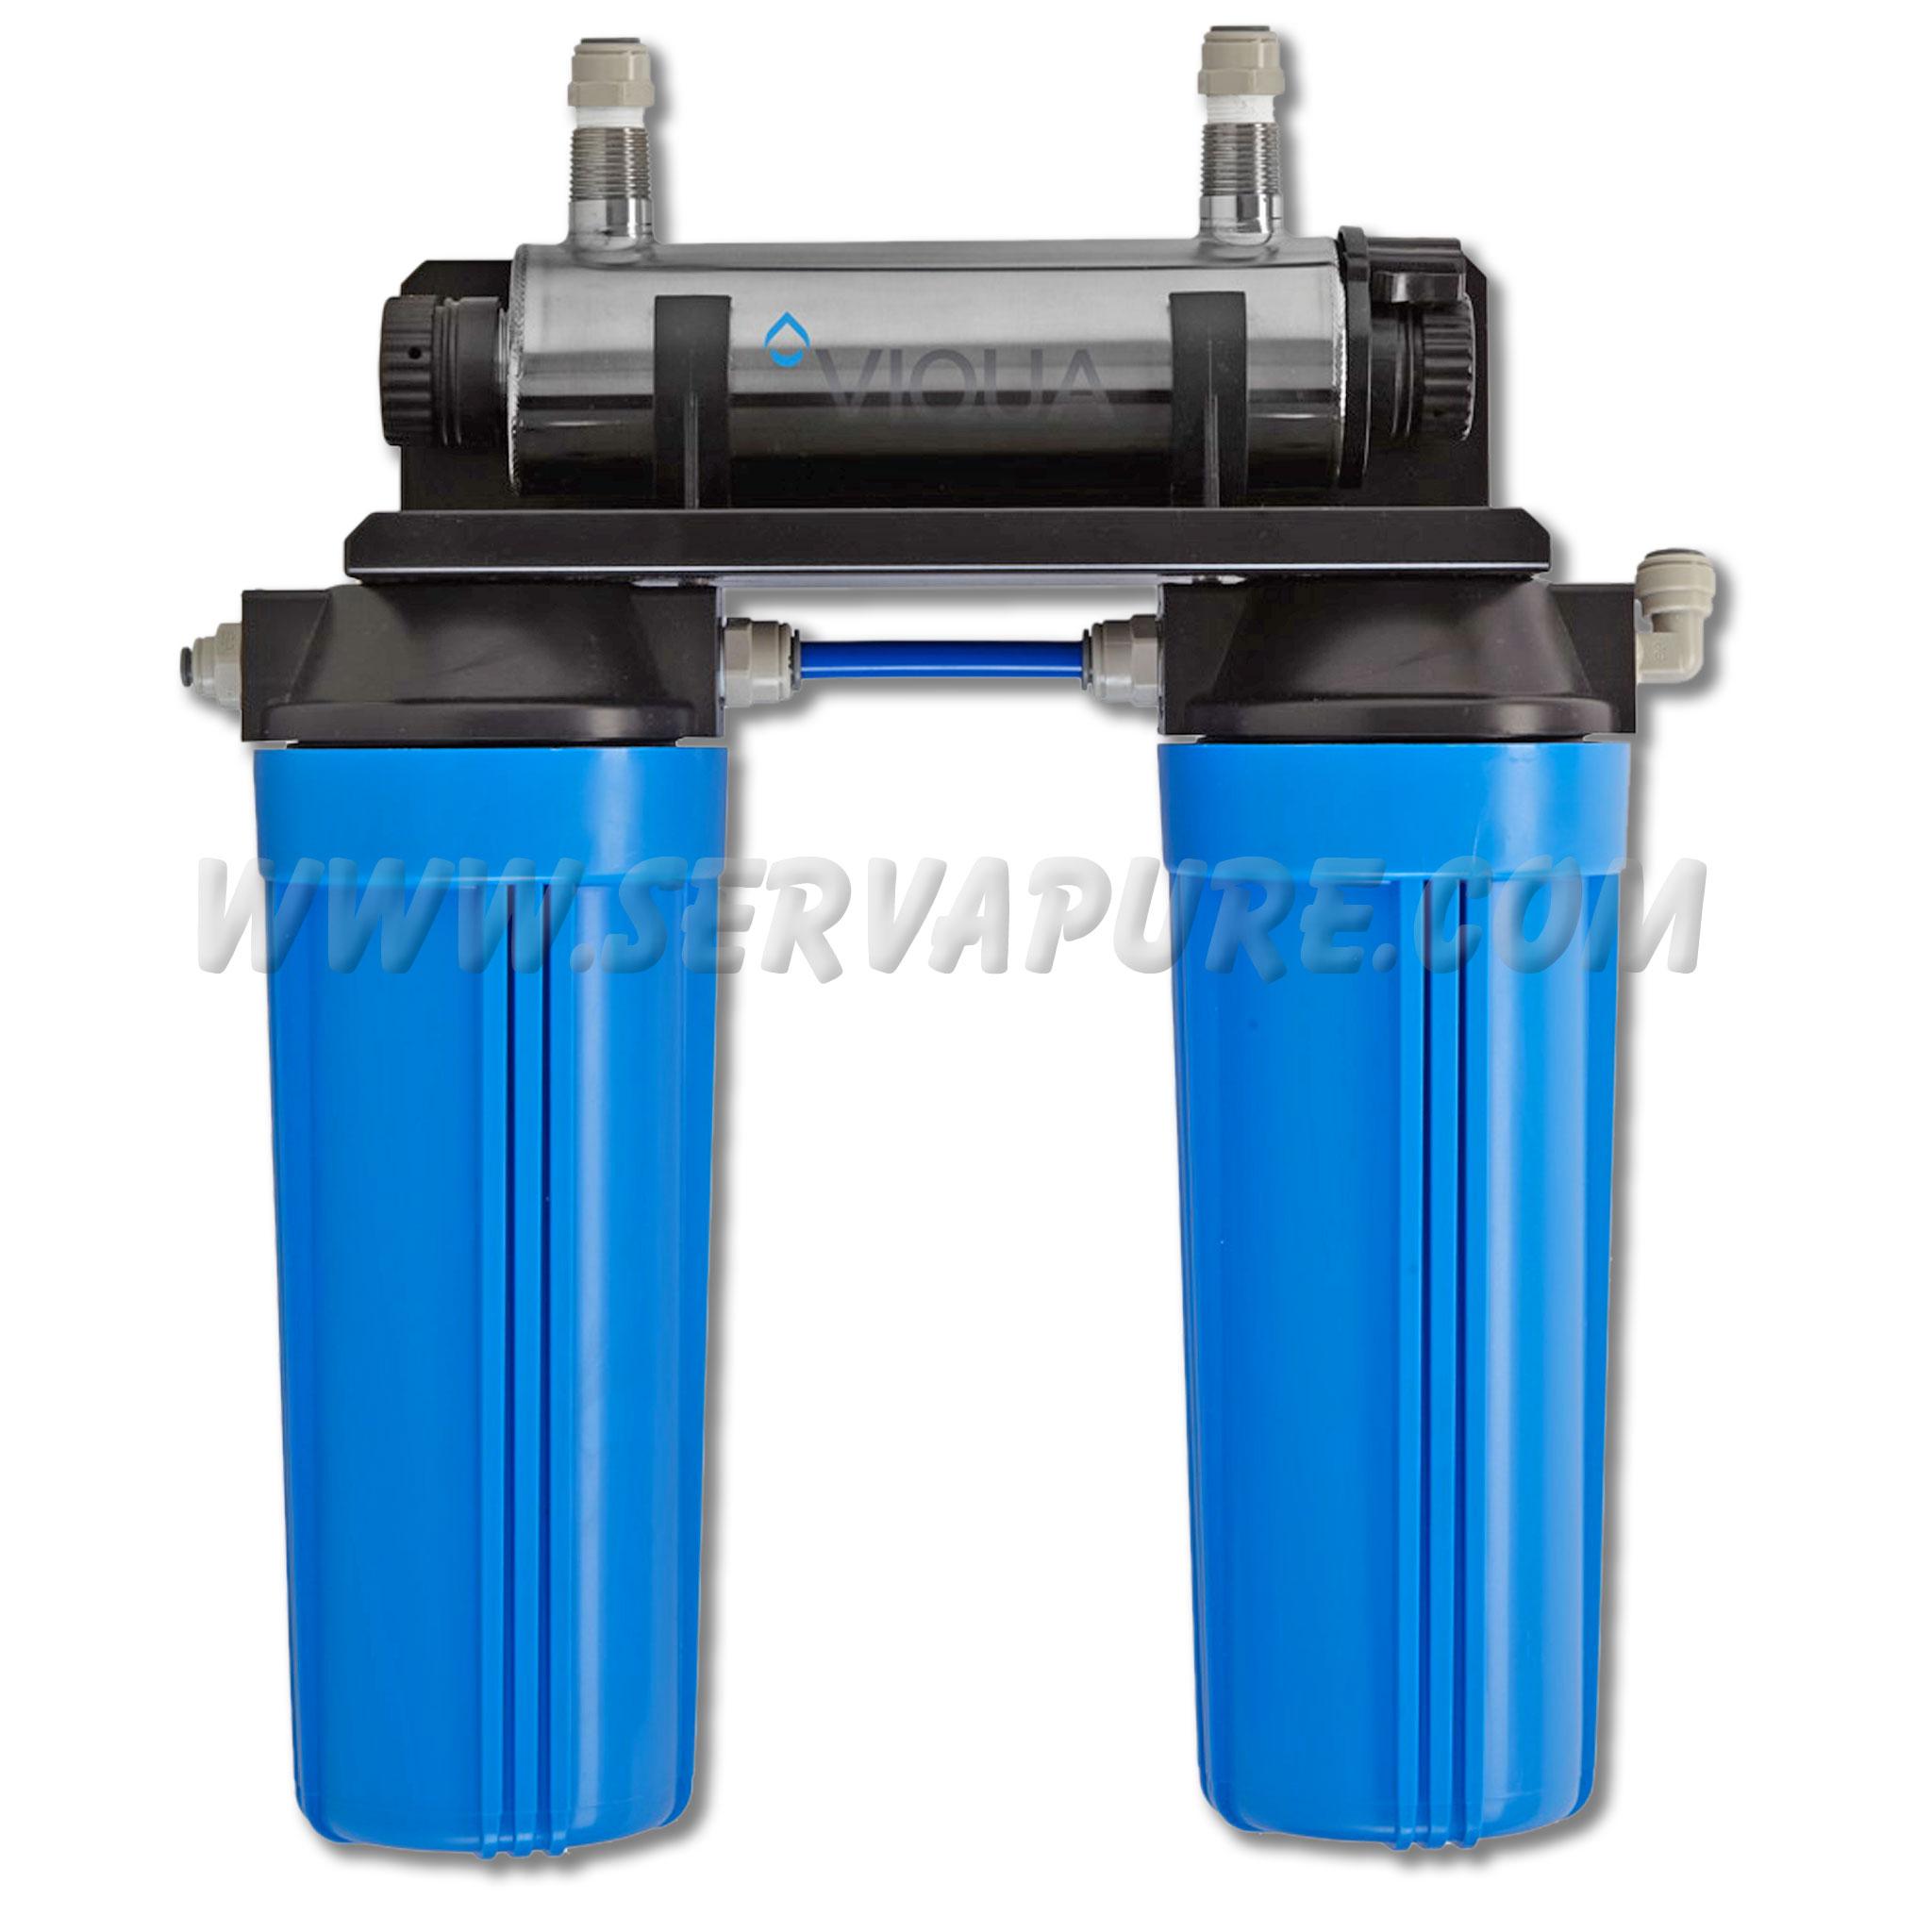 Viqua Vt1 Dws Drinking Water Uv System 1 Gpm Serv A Pure